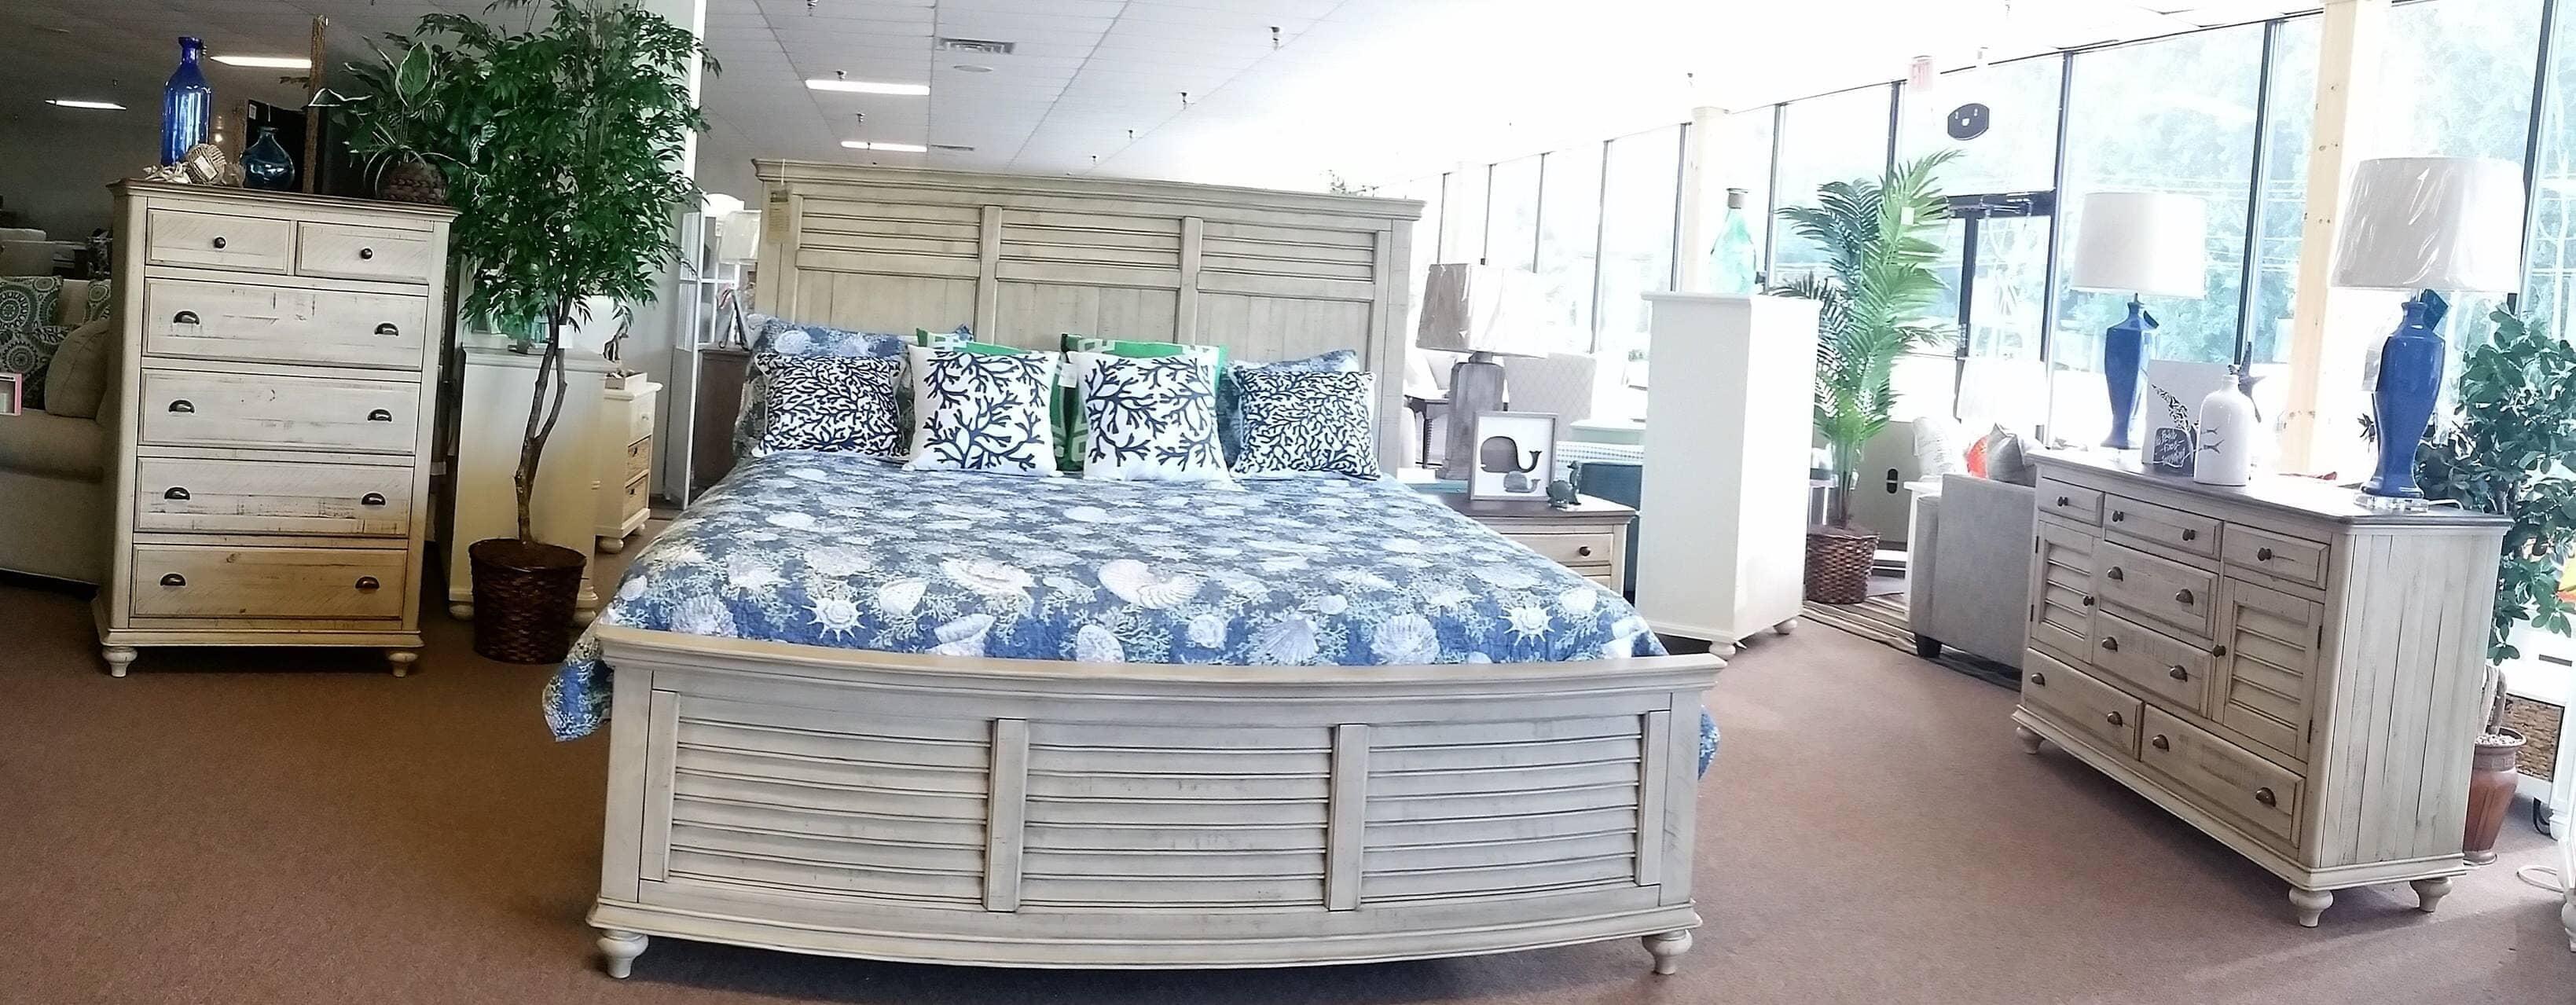 Sawyer S House Of Furniture Inc 1015 Us Hwy 17 Elizabeth City